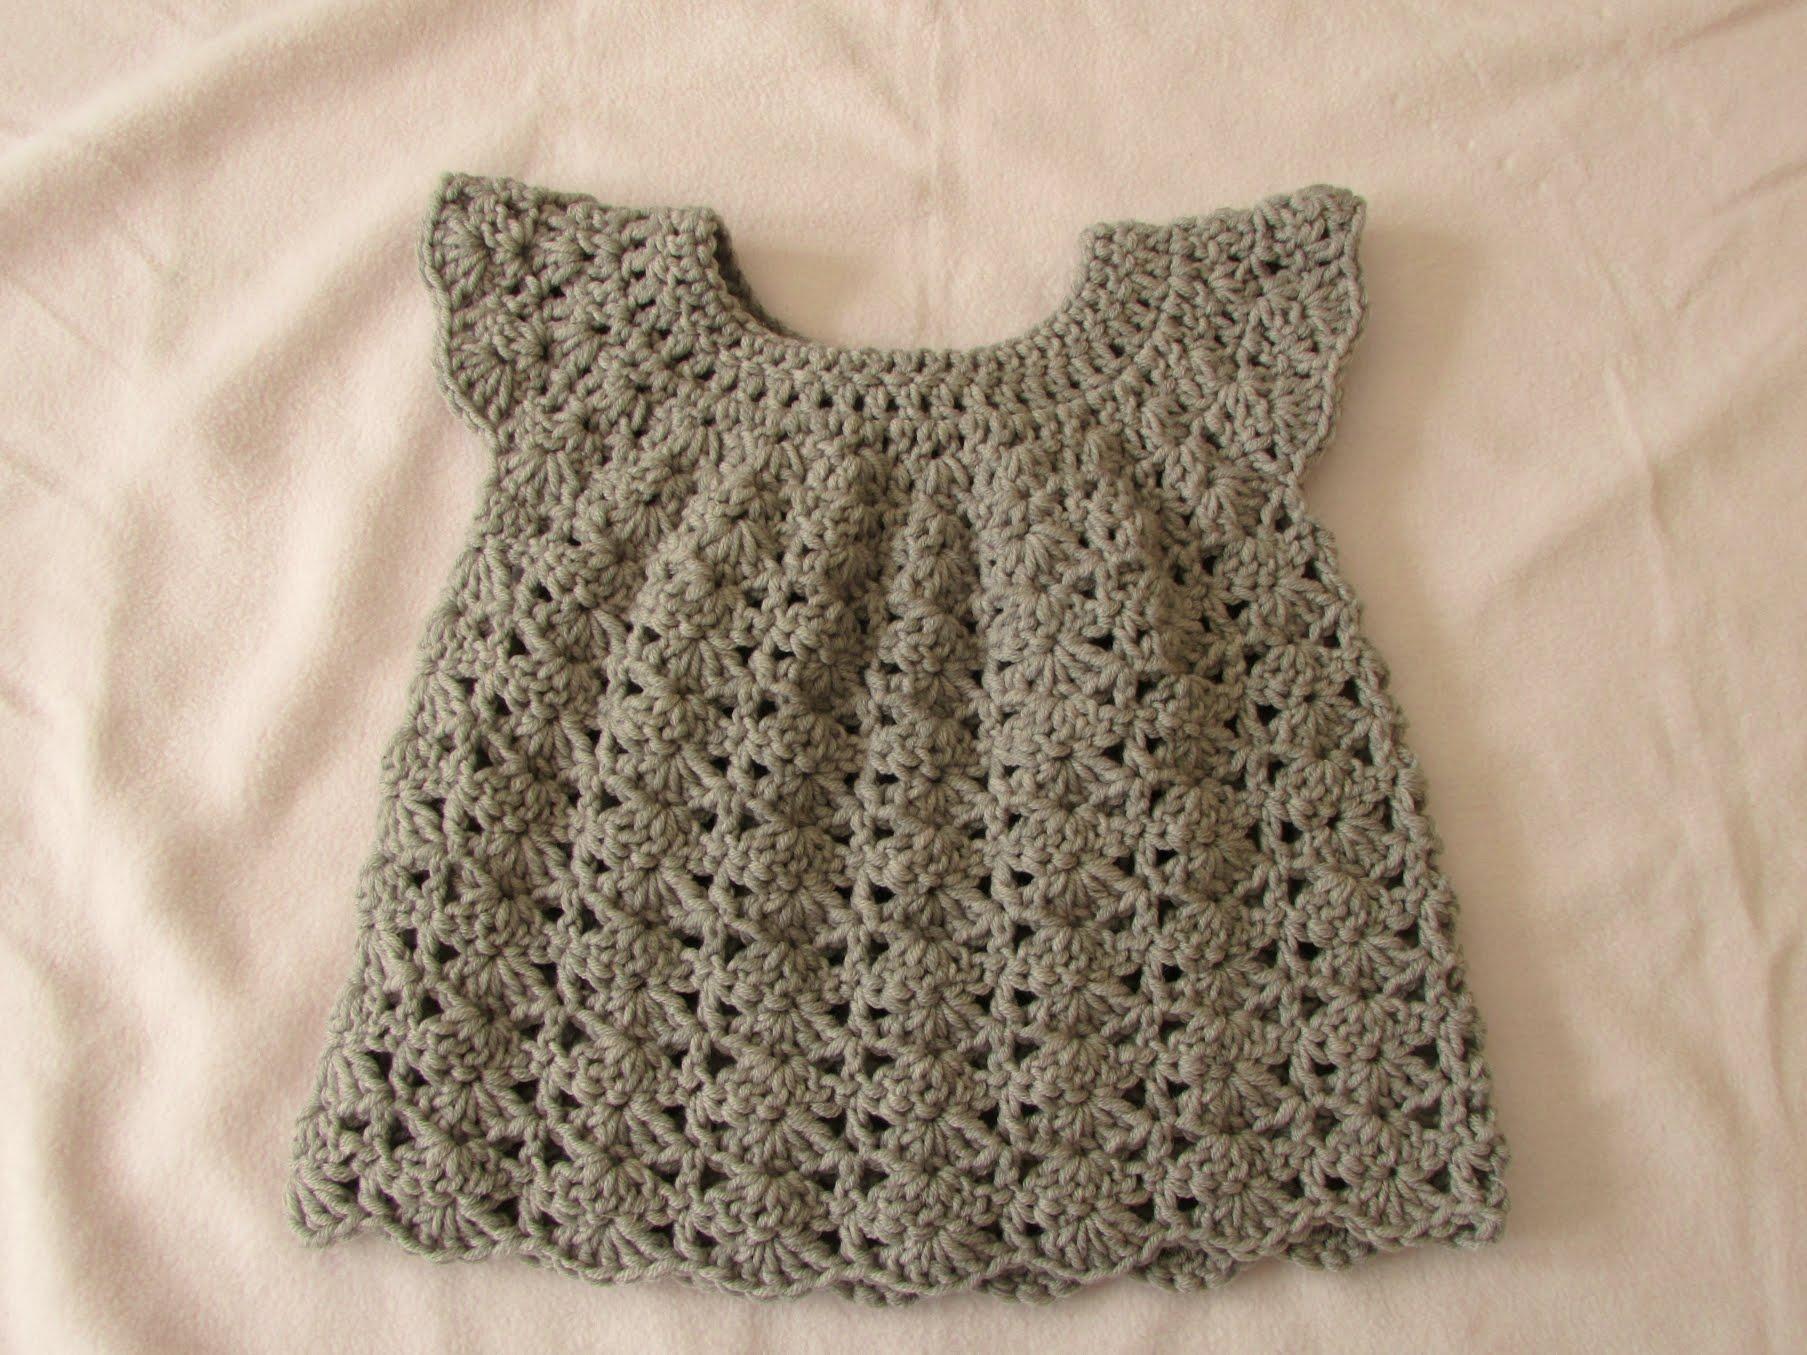 crochet baby dress how to crochet an easy shell stitch baby / girlu0027s dress for beginners semuzfg